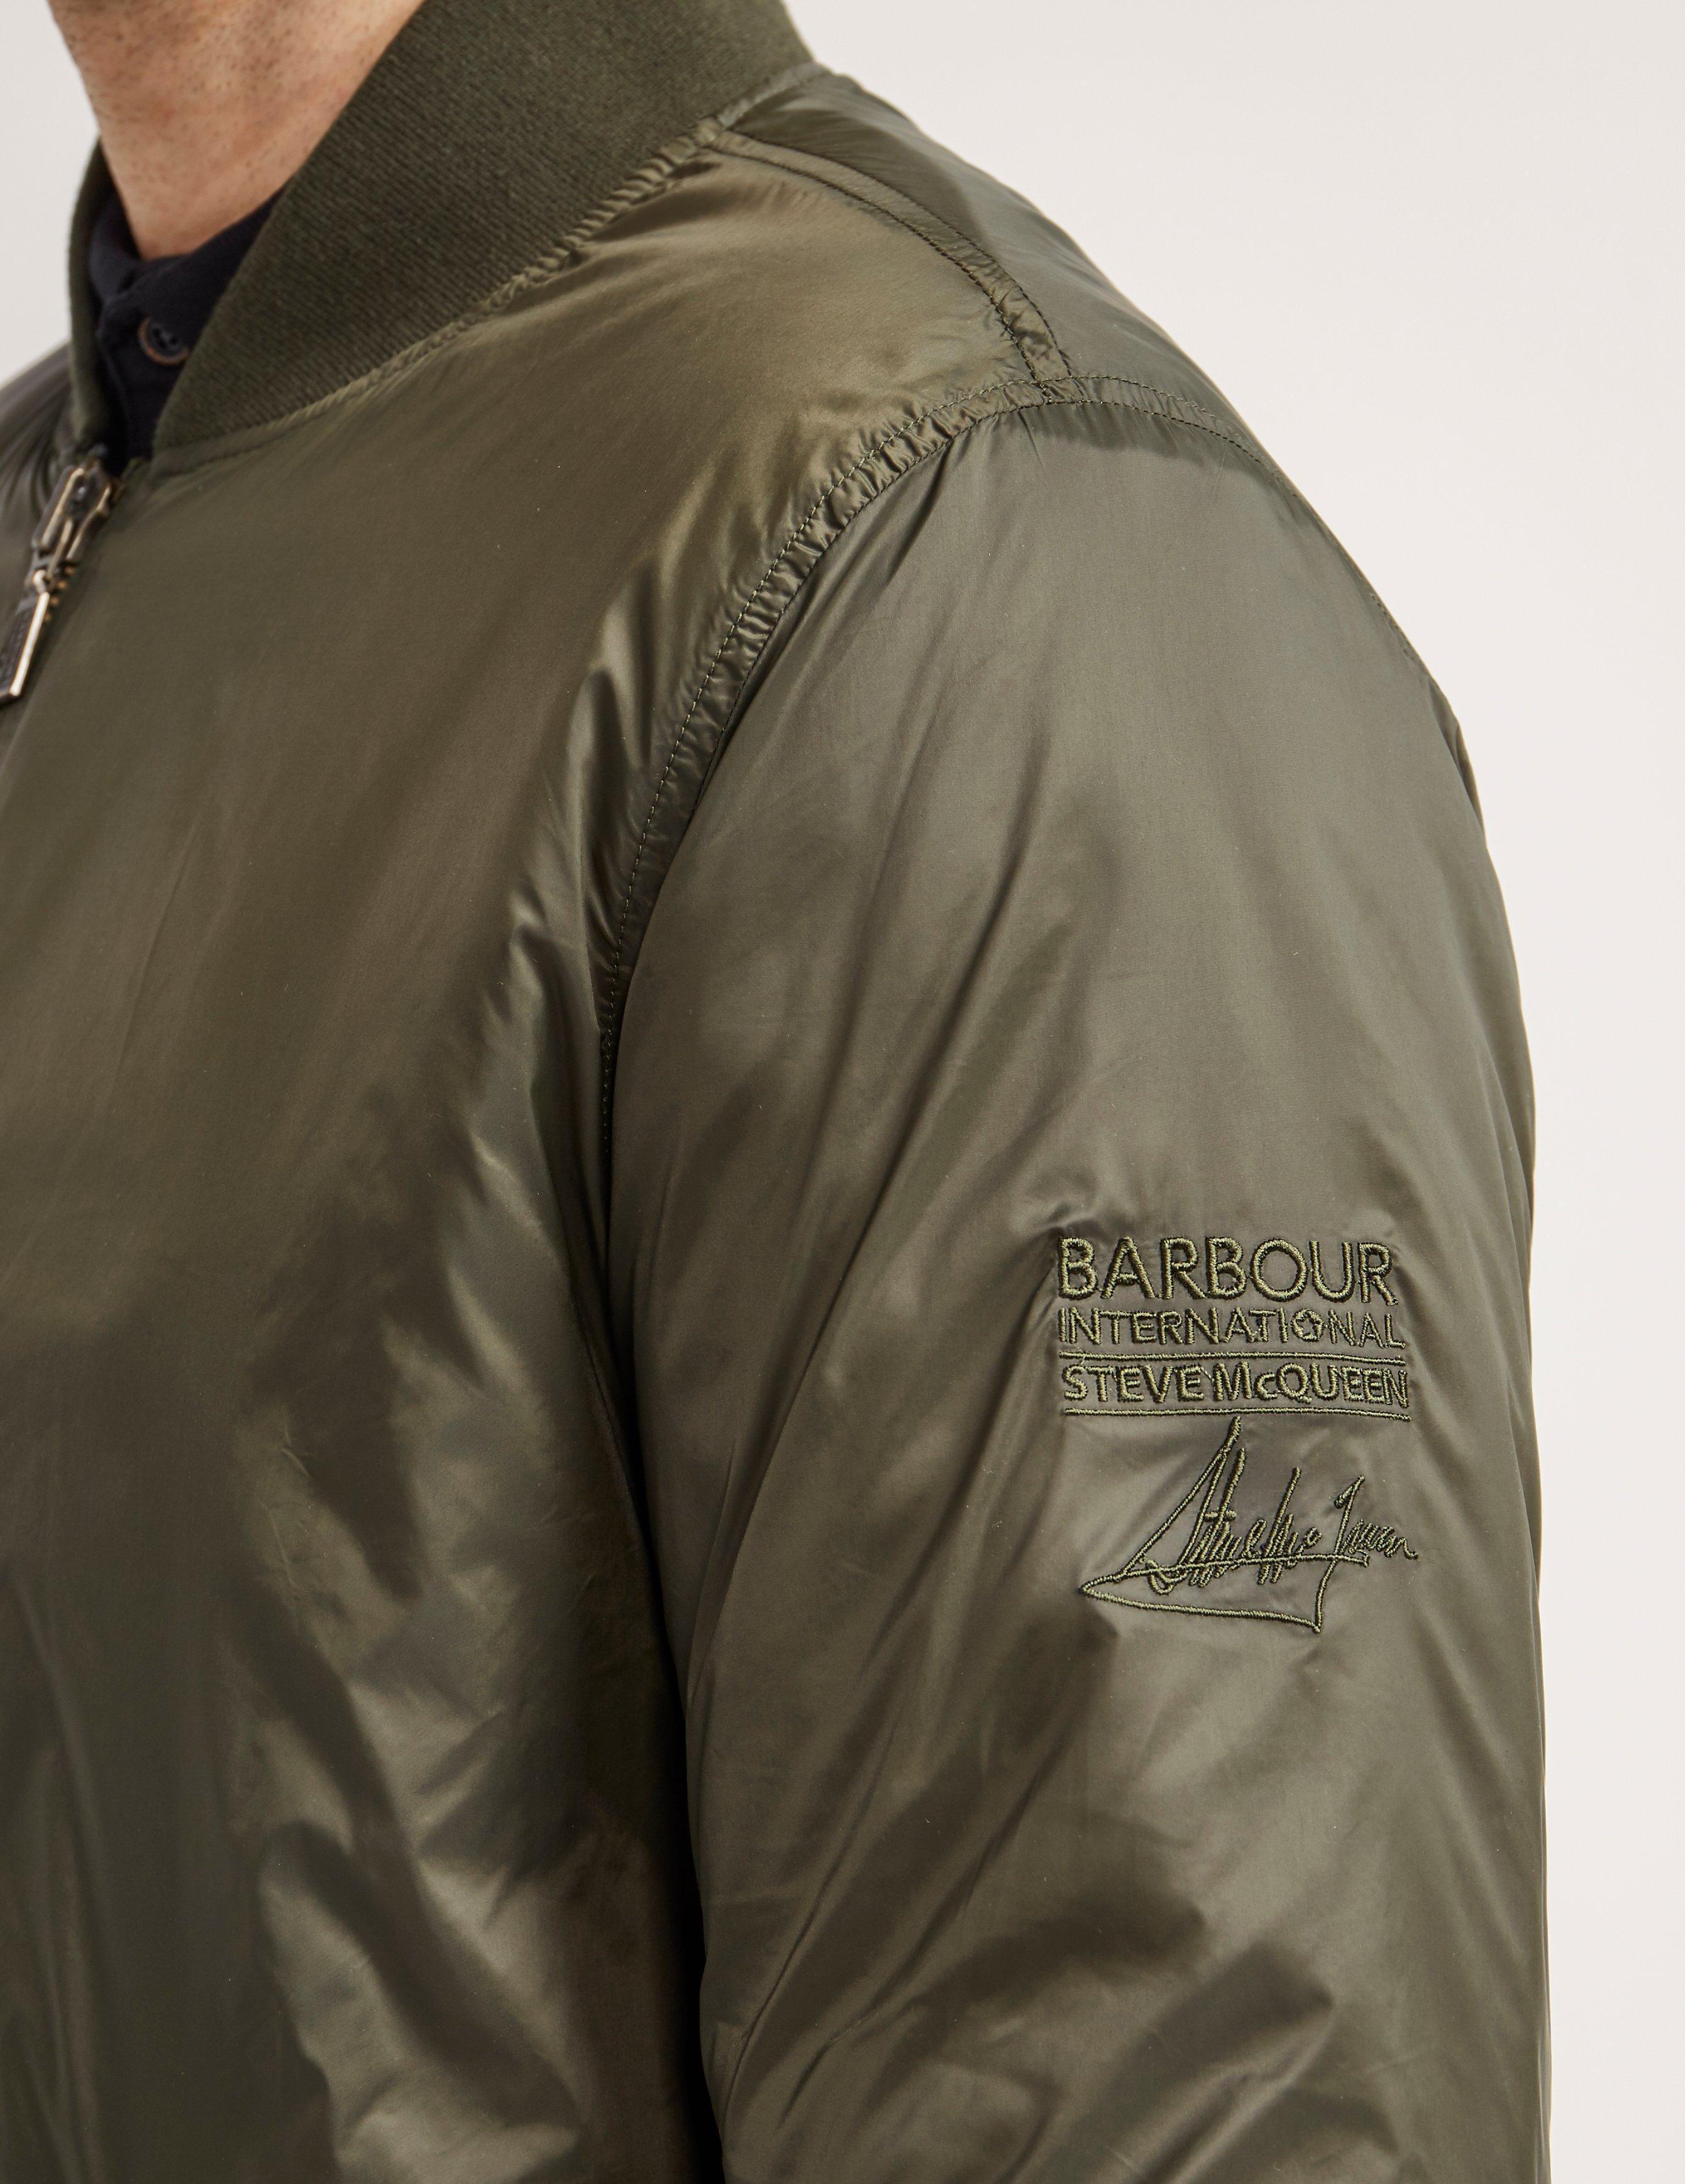 outlet boutique new design best quality International Steve Mcqueen Oil Field Jacket